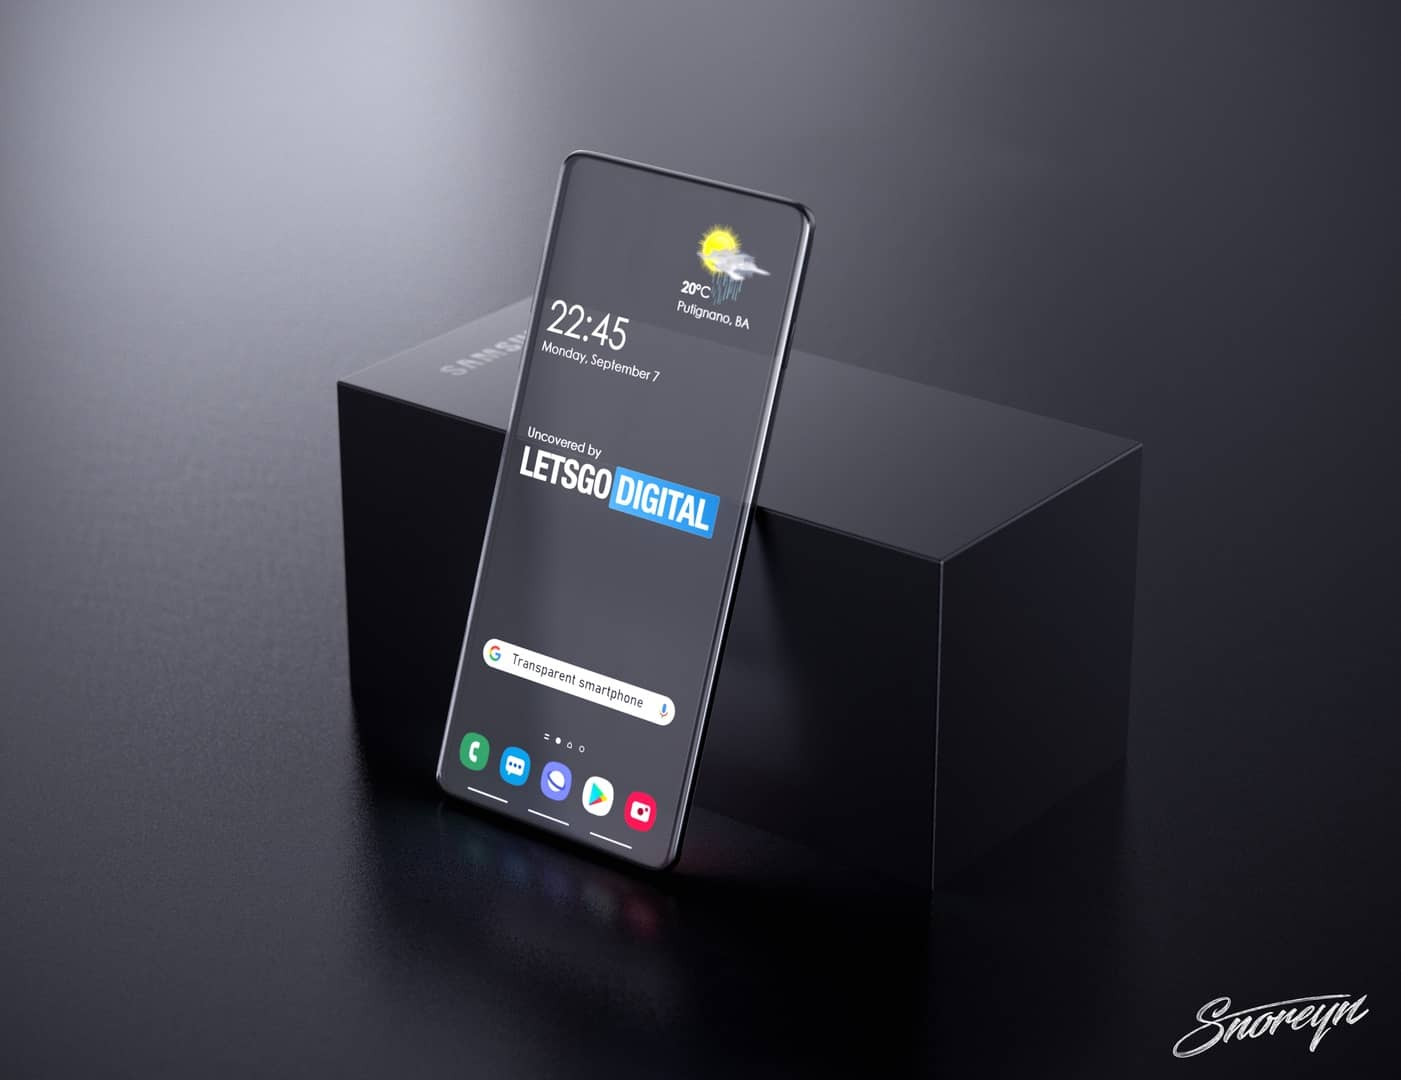 Samsung transparent smartphone Letsgodigital image 4